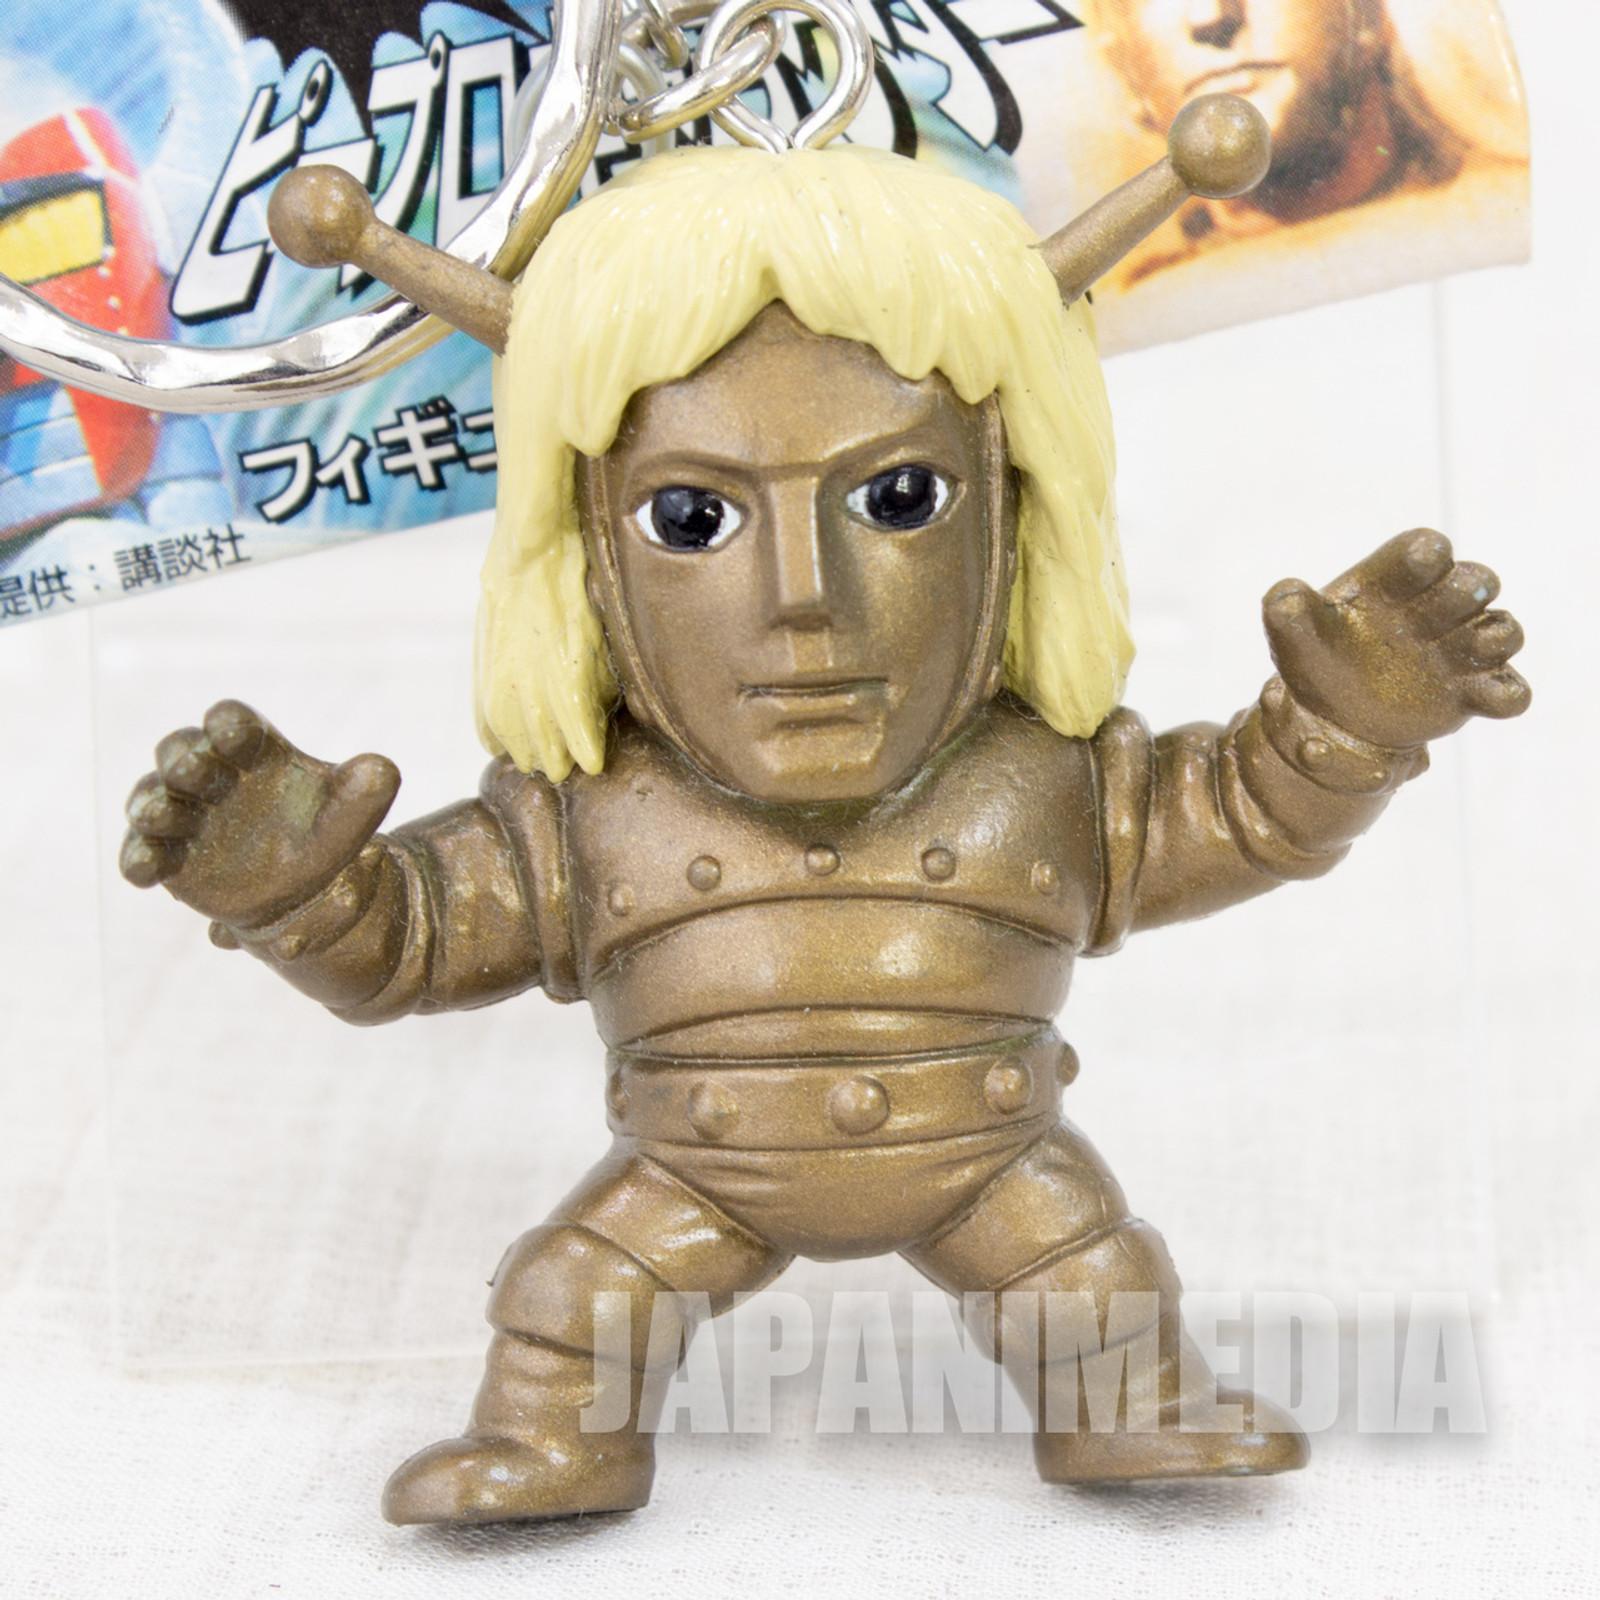 Space Giants Ambassador Magma Figure Key Chain JAPAN ANIME MANGA TOKUSATSU